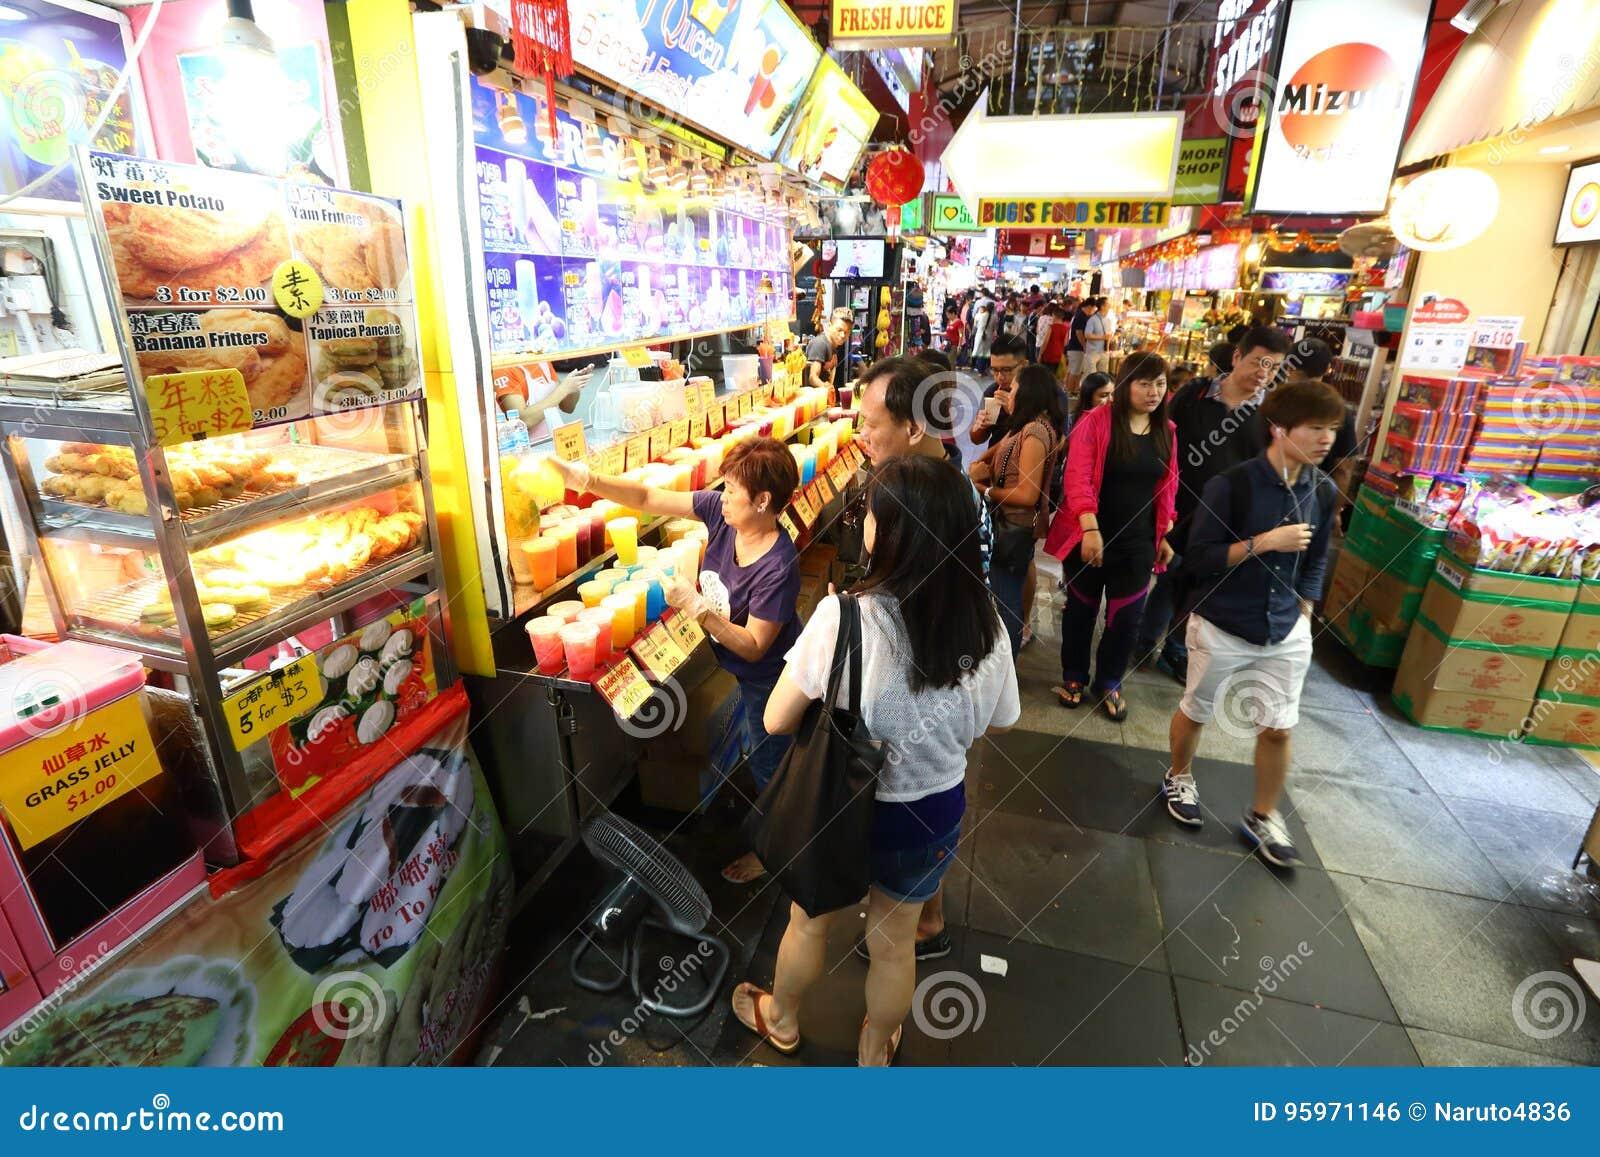 Singapore : Chinatown food street